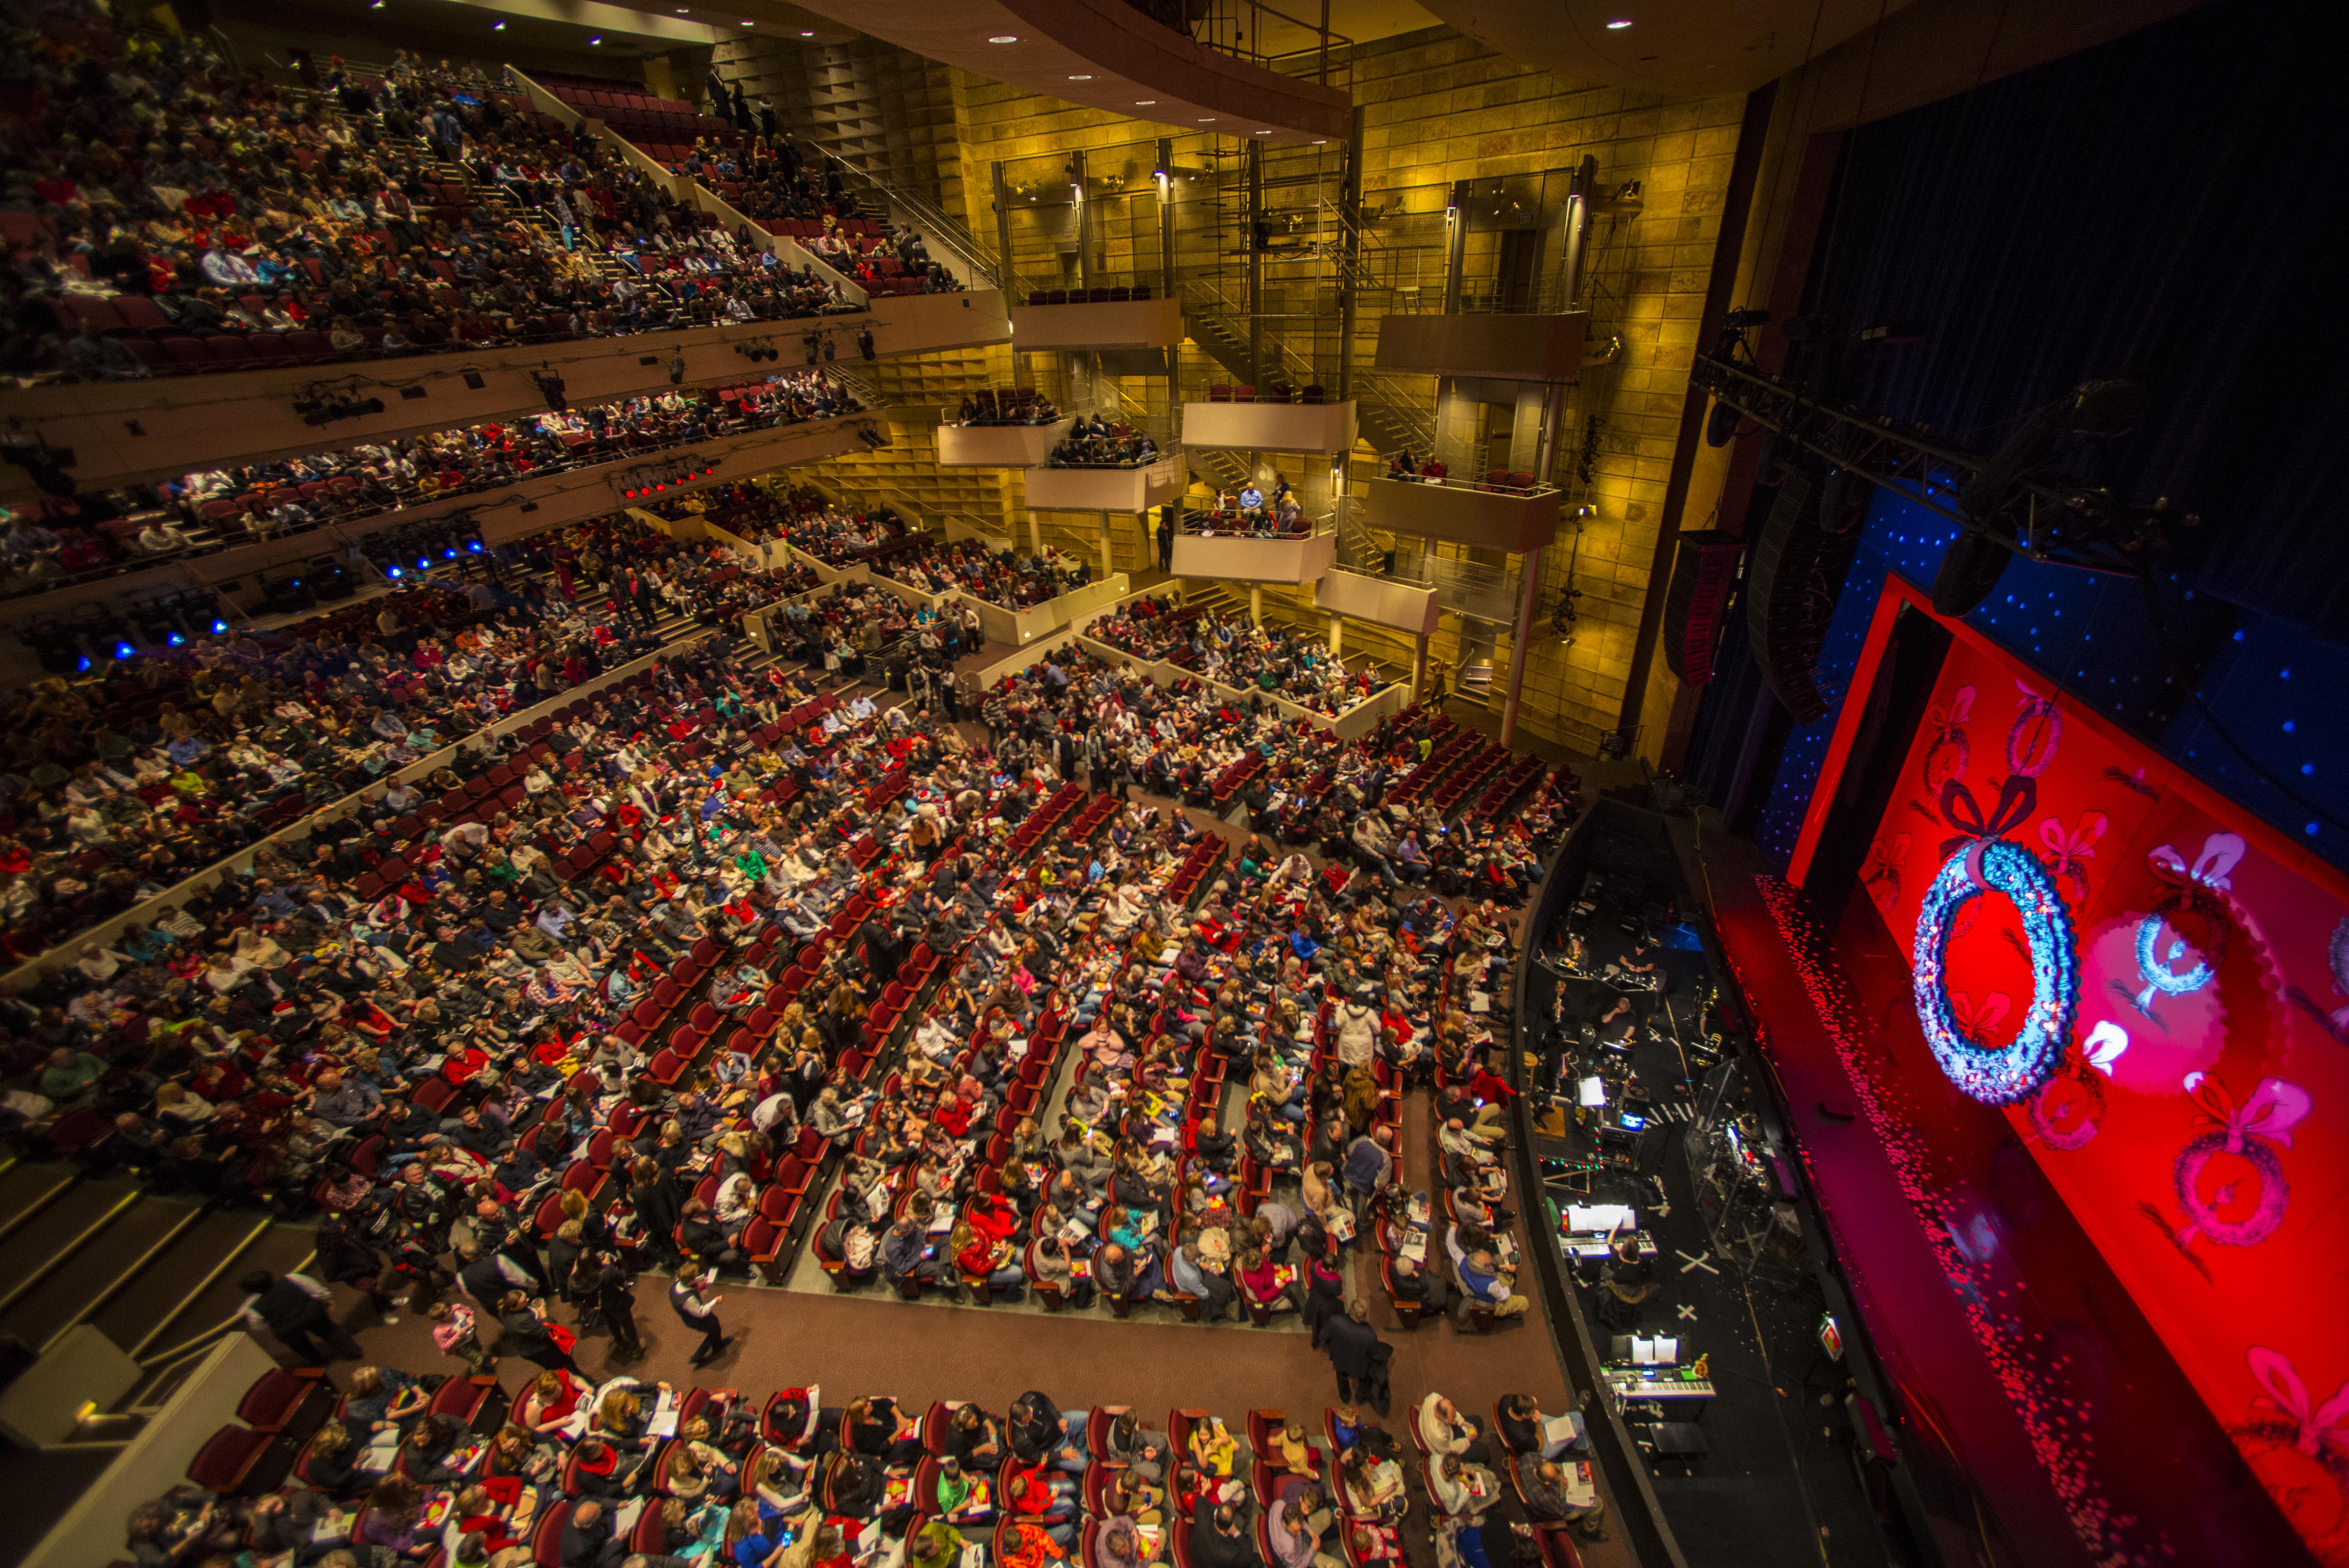 A Christmas Carol Denver 2019 Holiday Theater & Performances | VISIT DENVER